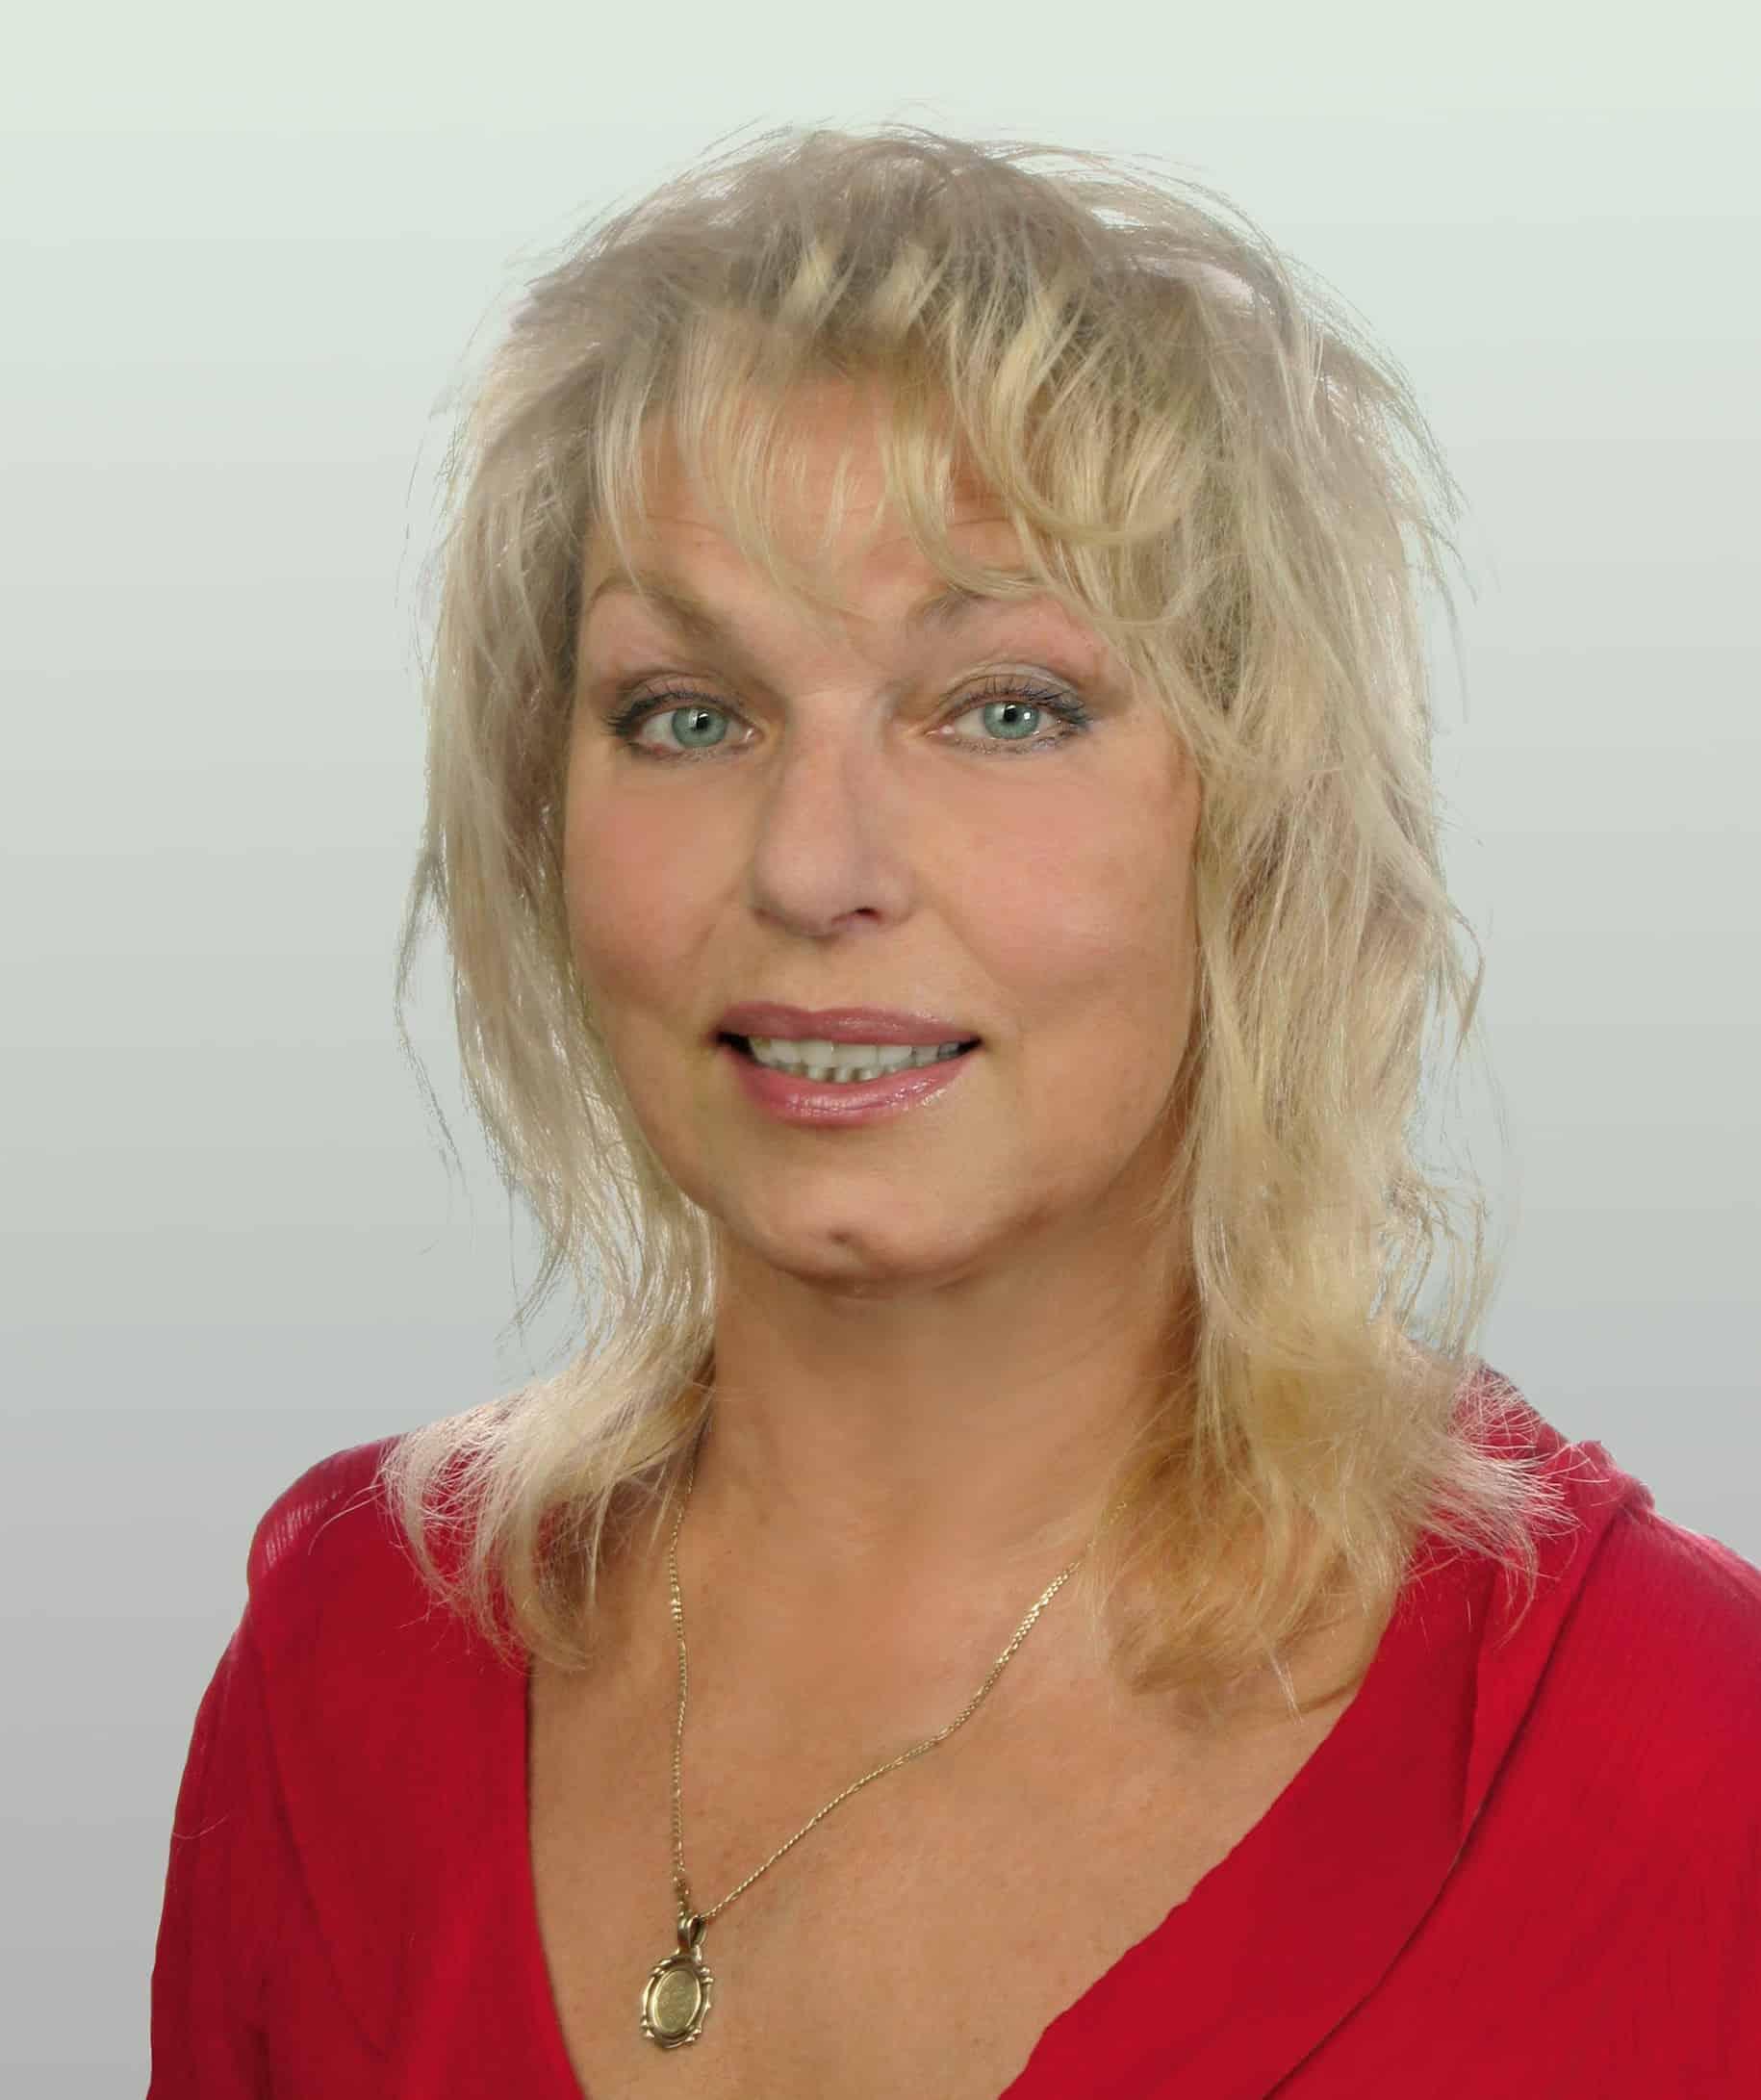 Katarzyna Gärtner